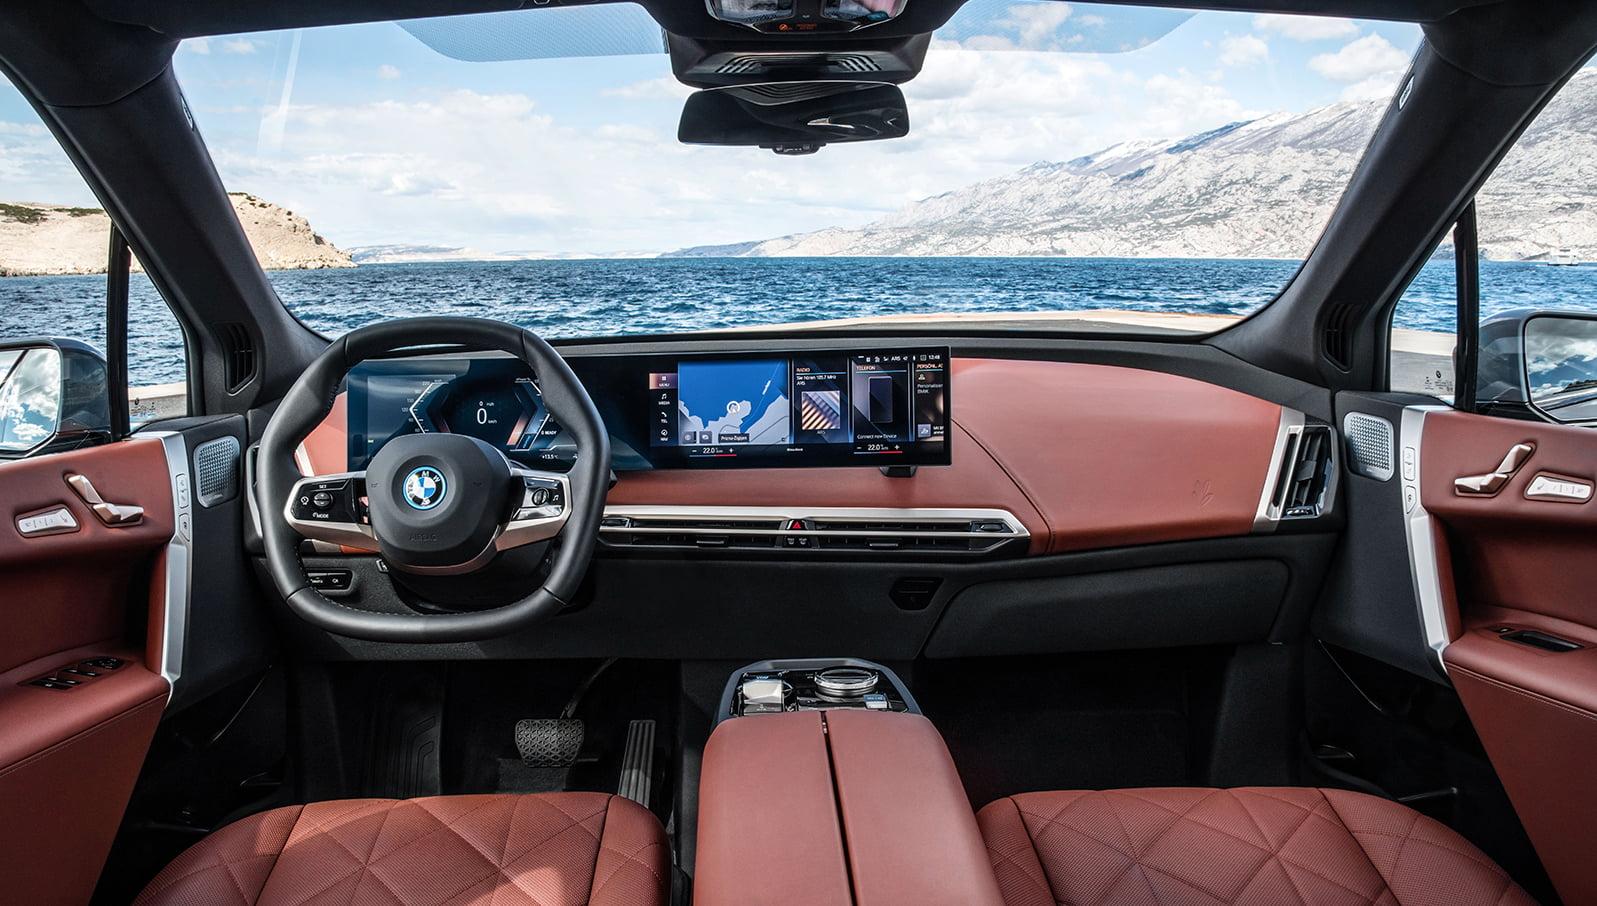 BMW iX interior I